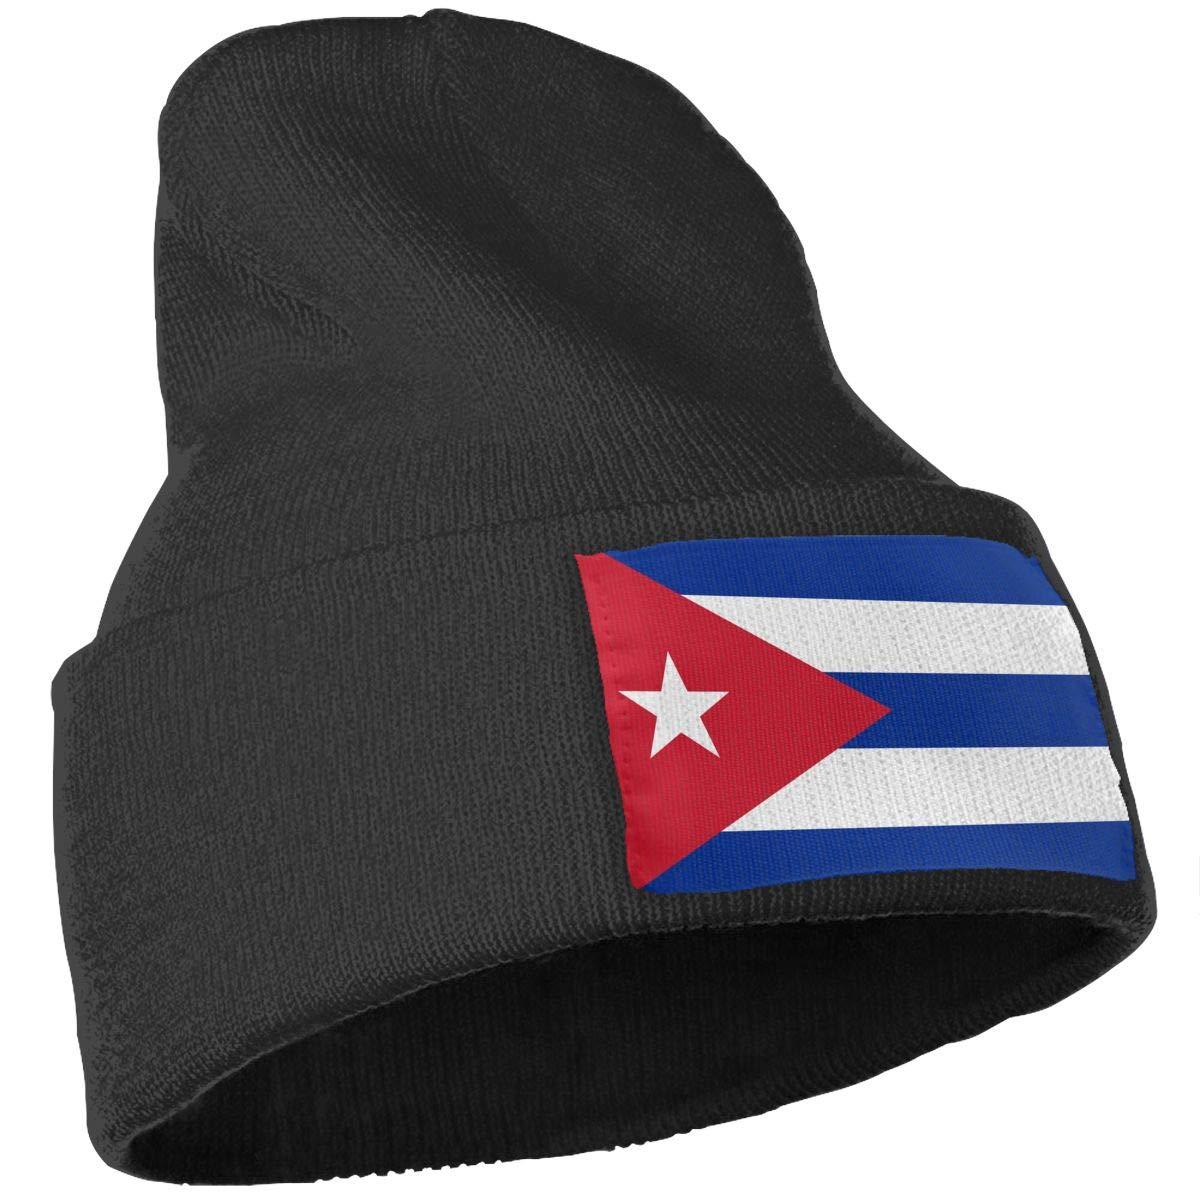 COLLJL-8 Men//Women Cuba Flag Outdoor Fashion Knit Beanies Hat Soft Winter Skull Caps